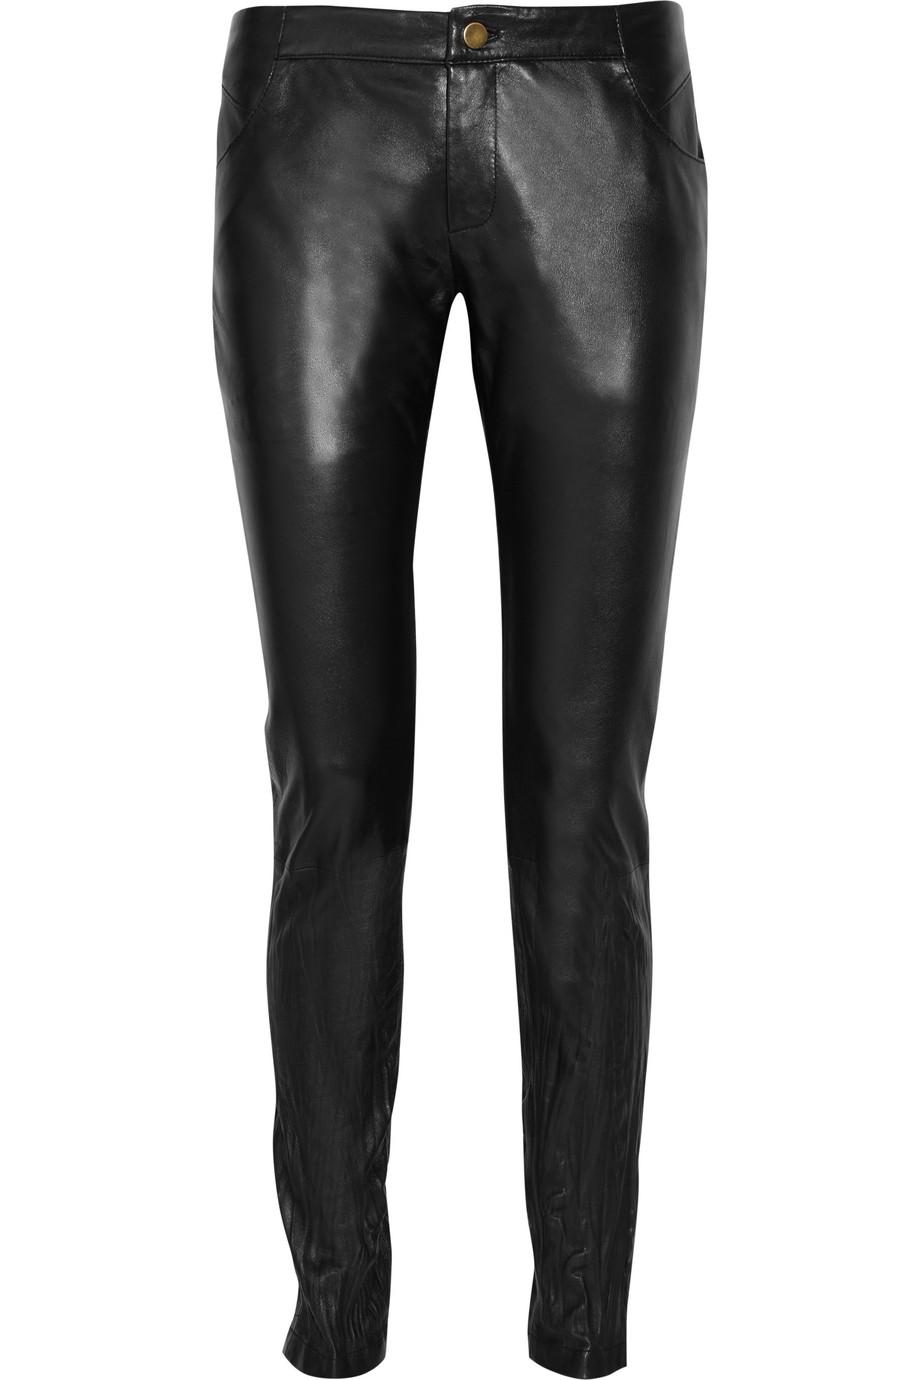 Sara berman Skinny Leather Pants in Black | Lyst